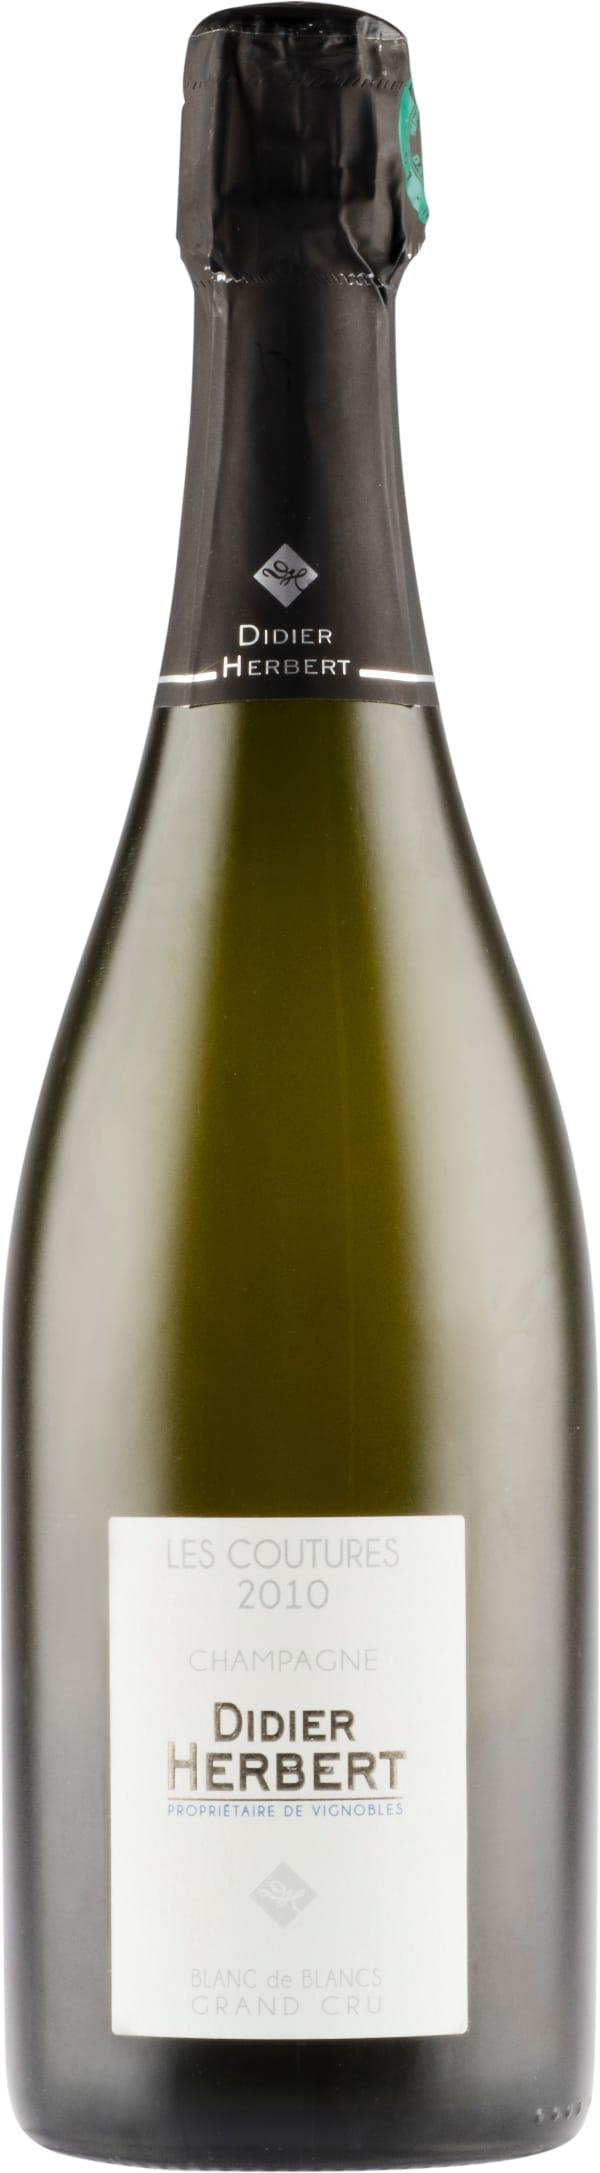 Didier Herbert Grand Cru Blanc de Blancs Les Coutures Champagne Brut 2010